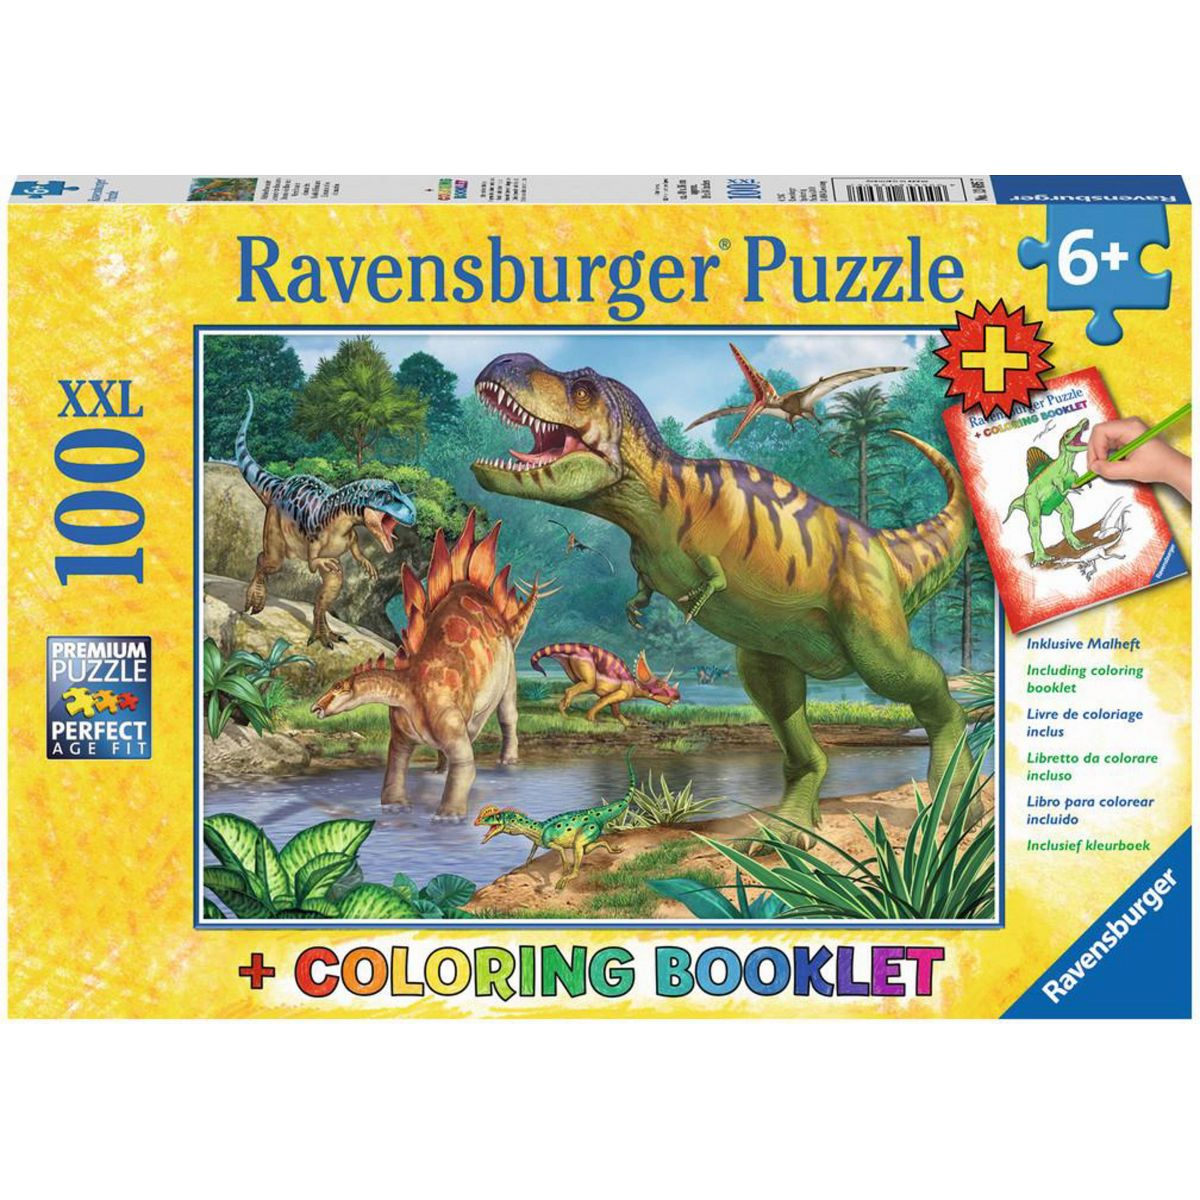 Ravensburger Puzzle Premium Svet dinosaurov 100XXL dielikov + Coloring Booklet